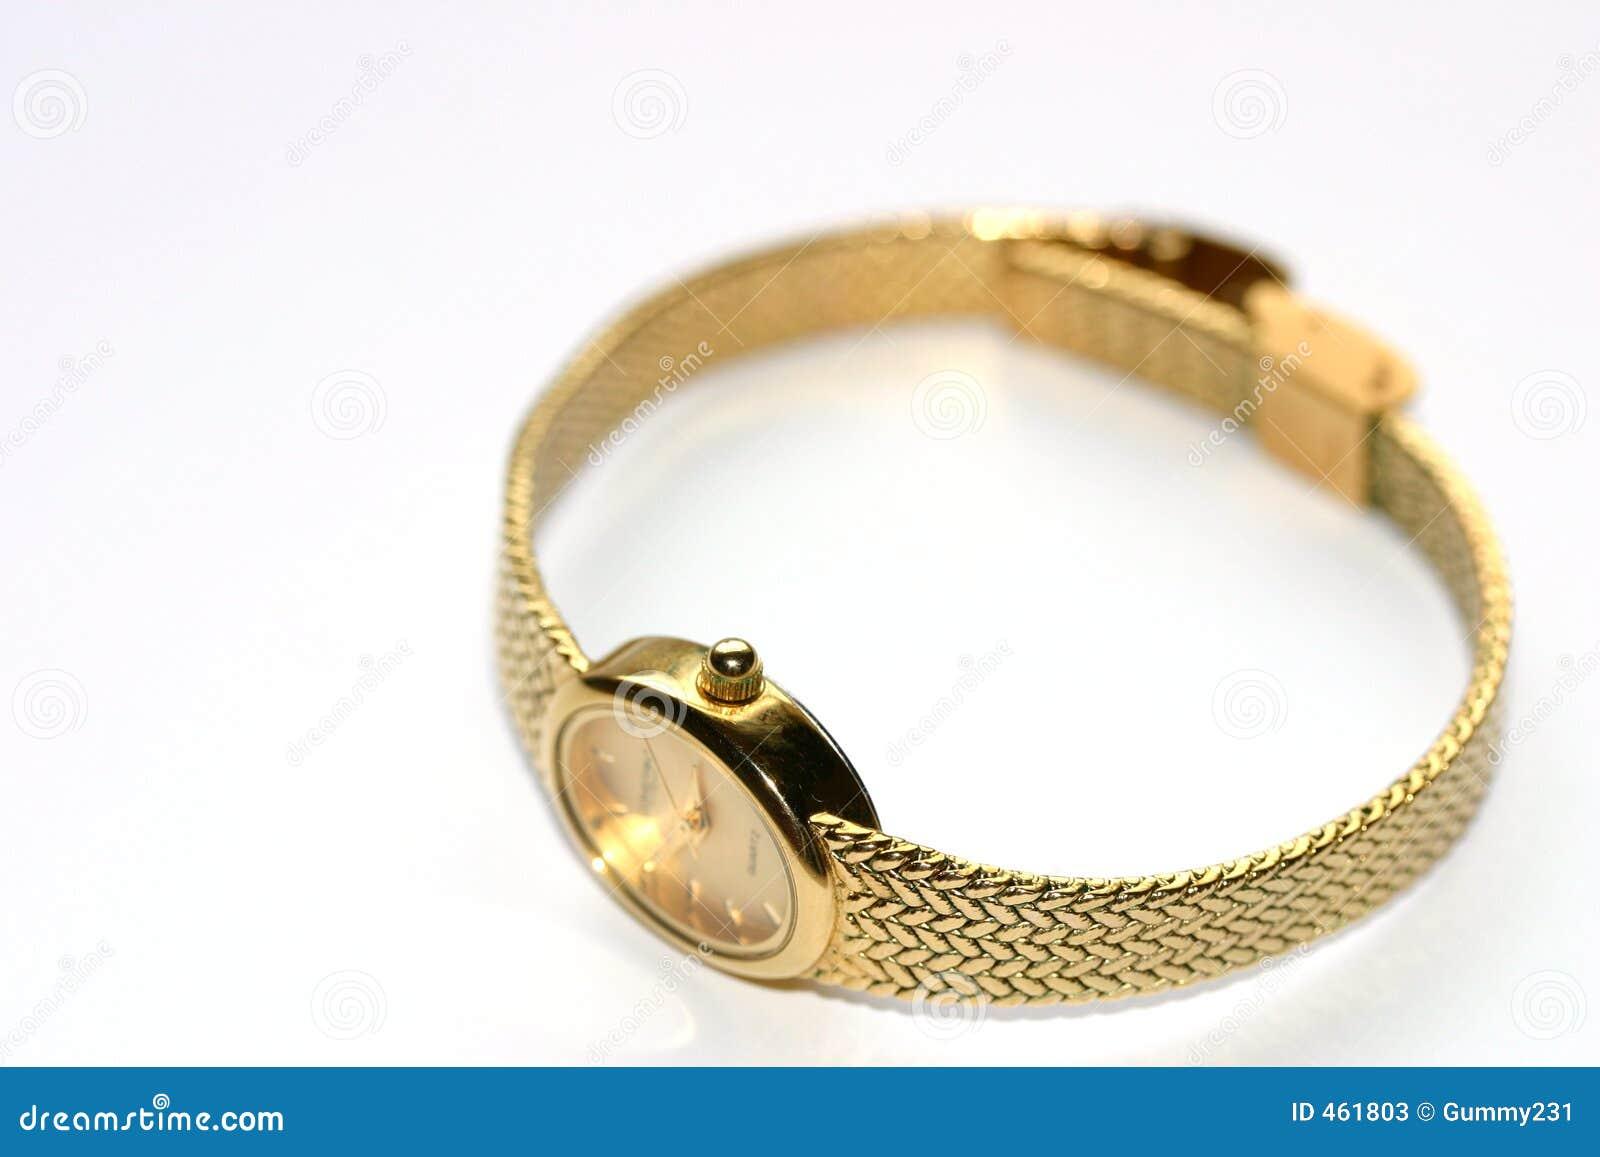 Pani zegarek